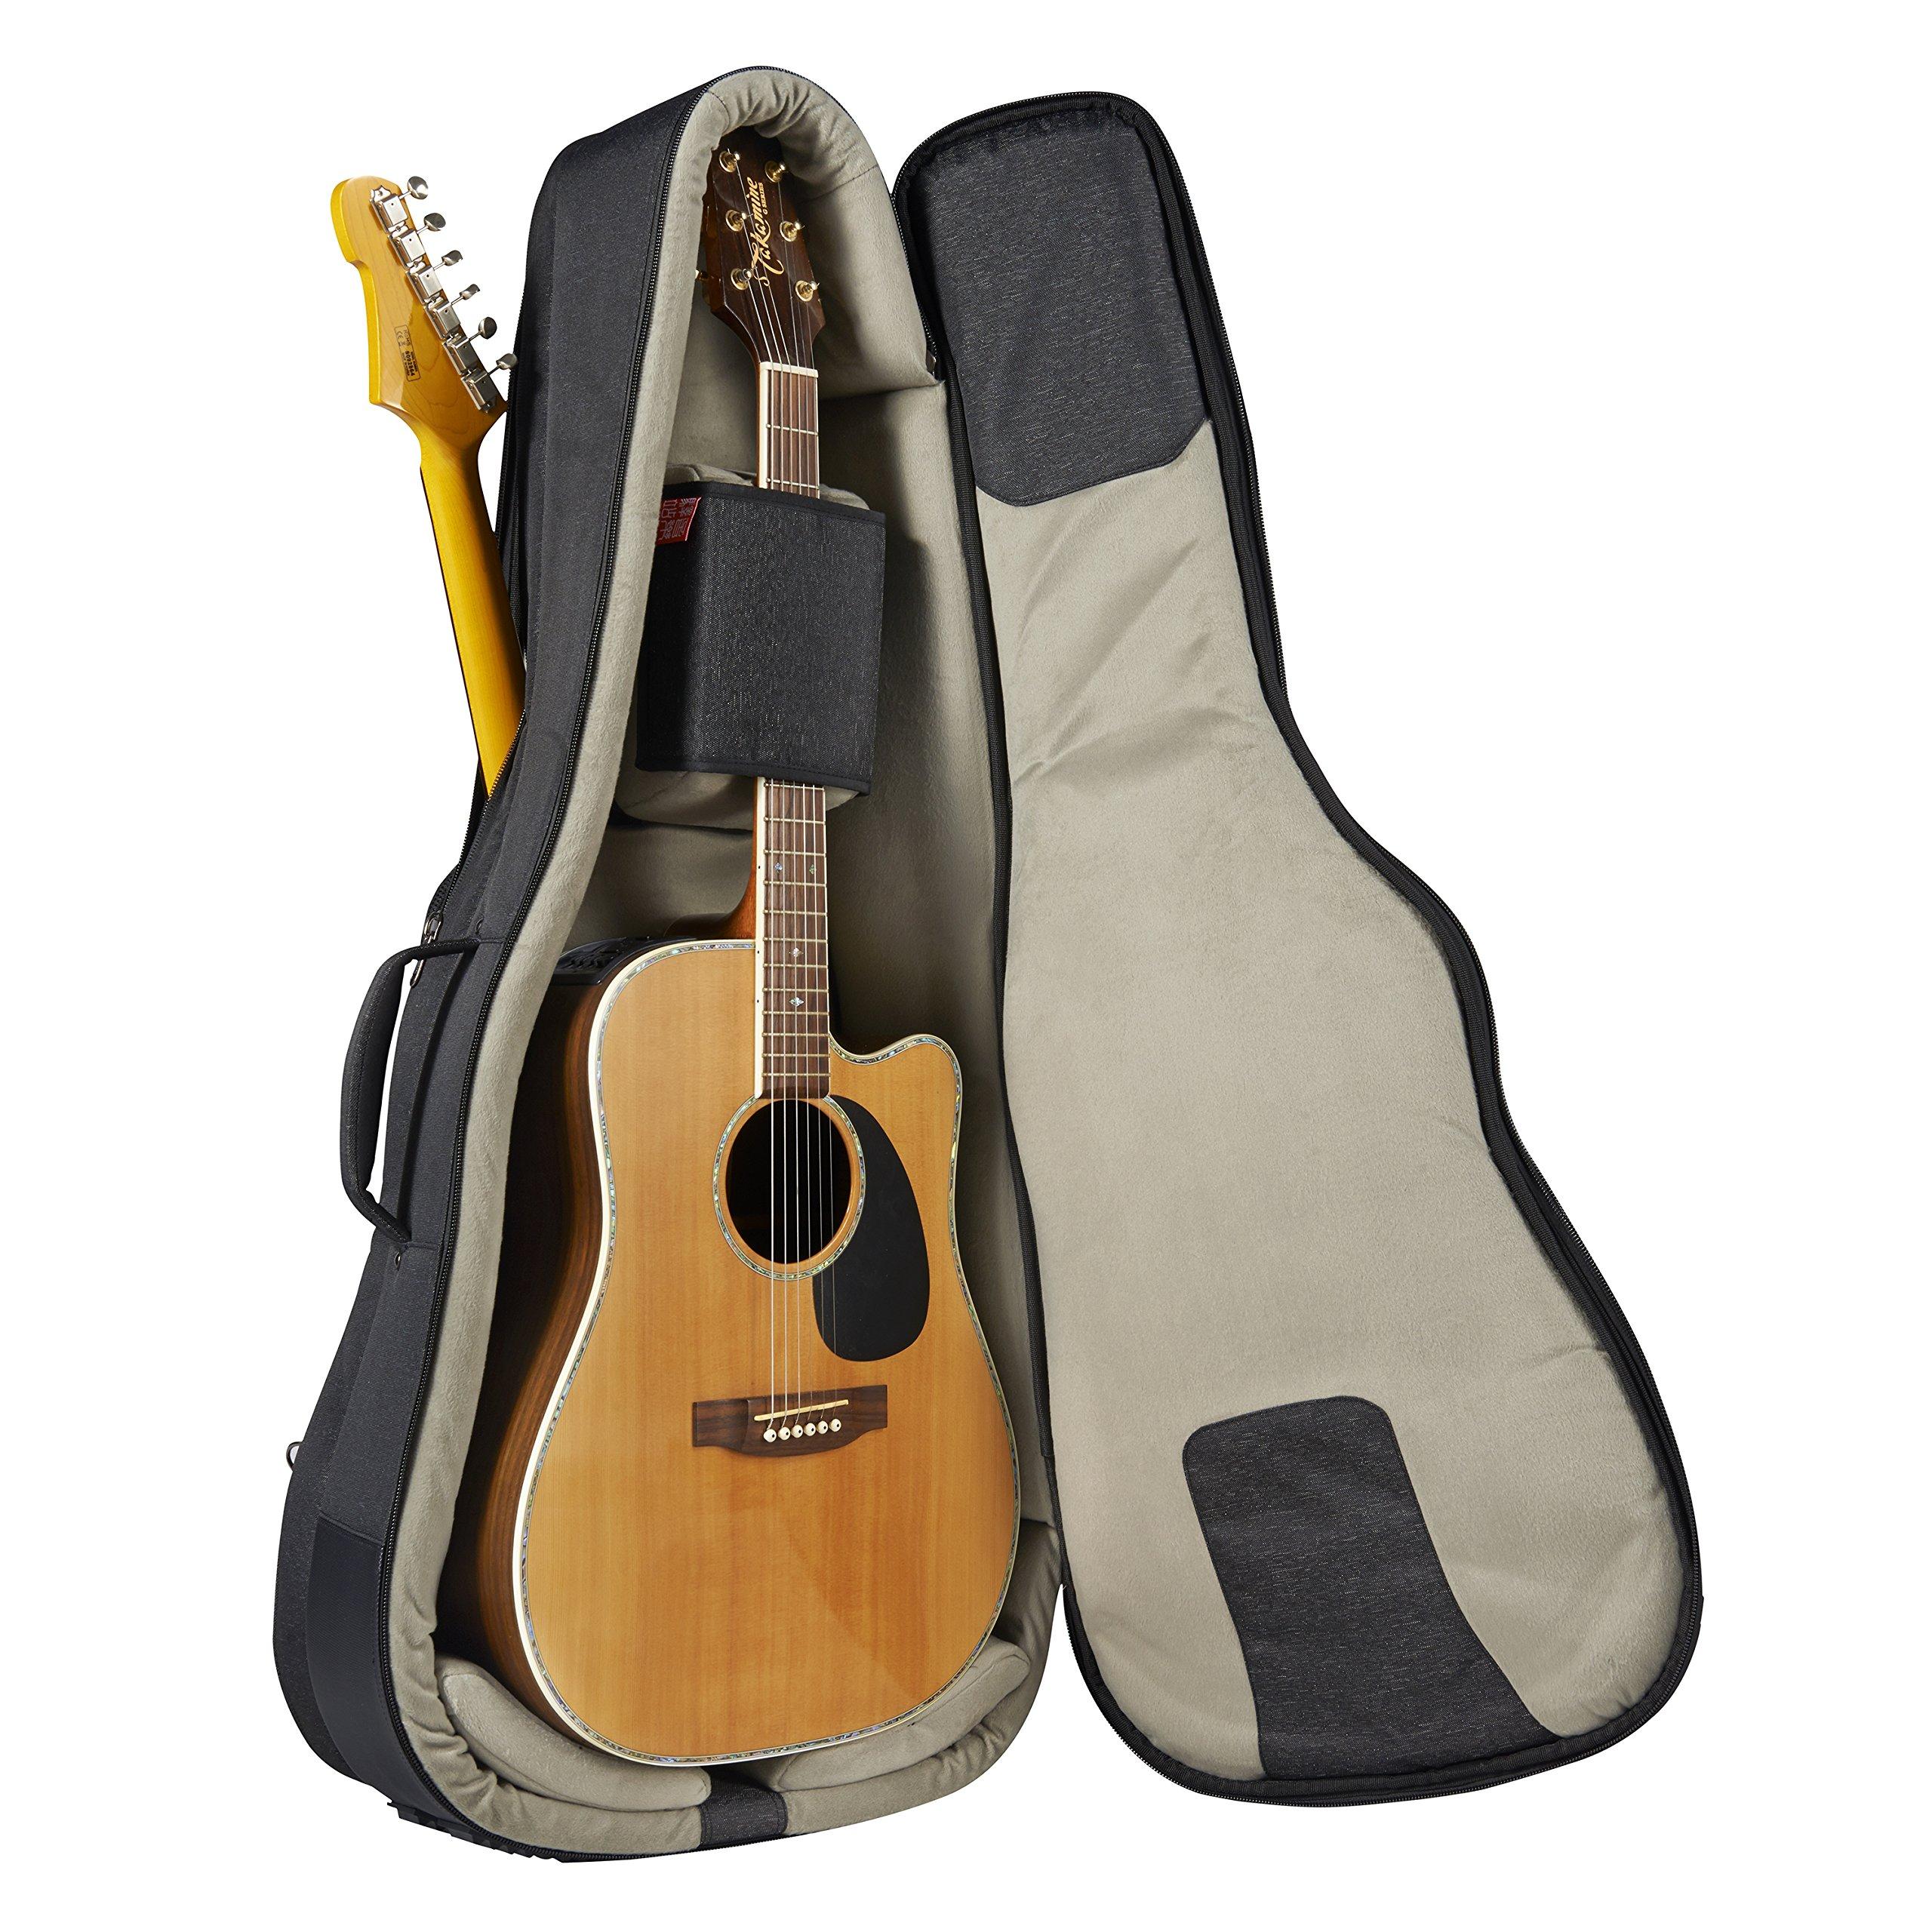 462c6dc9c1 Music Area TANG 30 Series Acouelec bag - Black TANG30-2AG-BLK product image